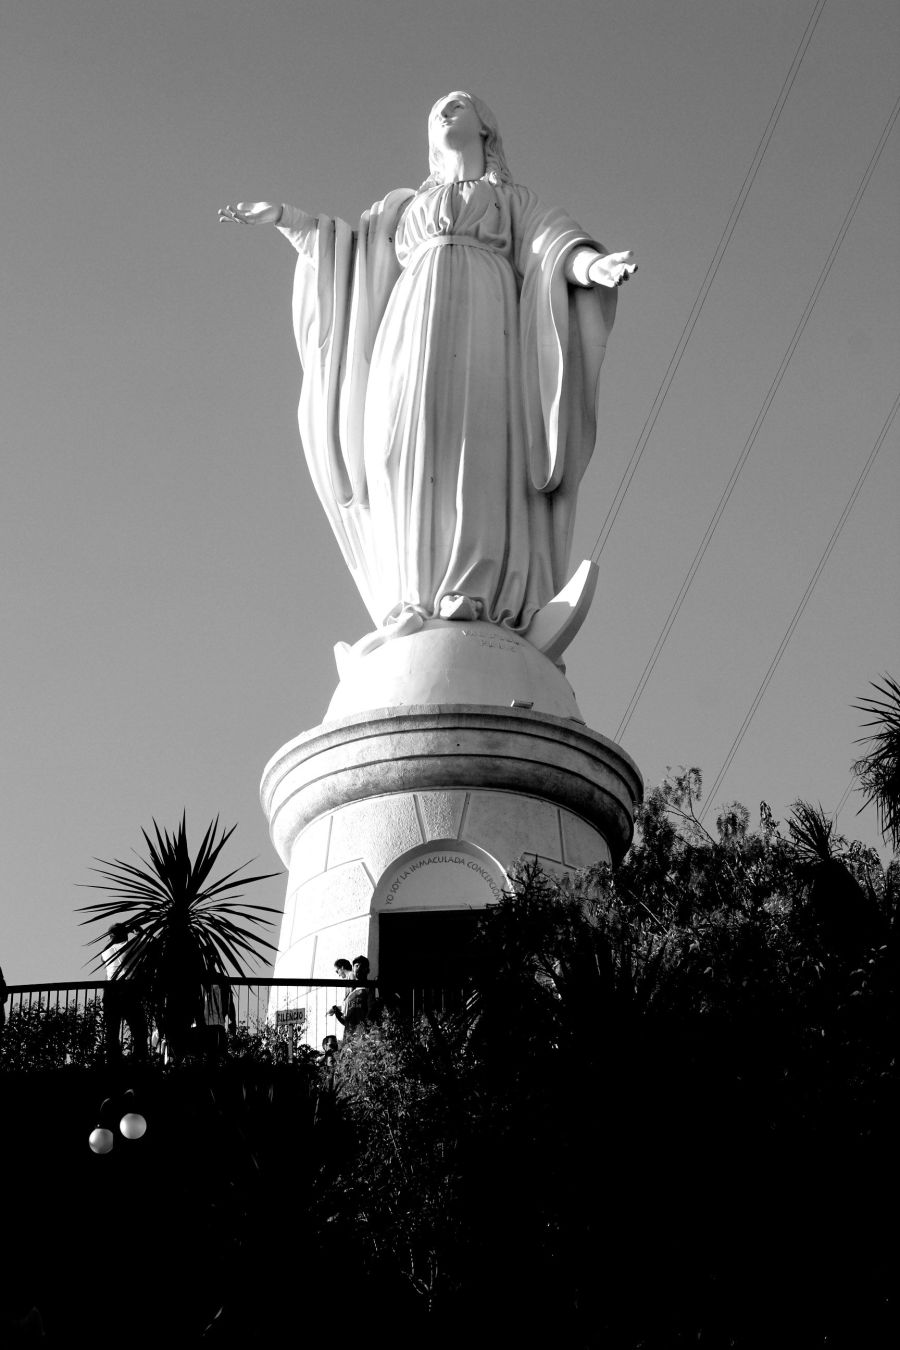 chile santiago san cristobal hill virgin